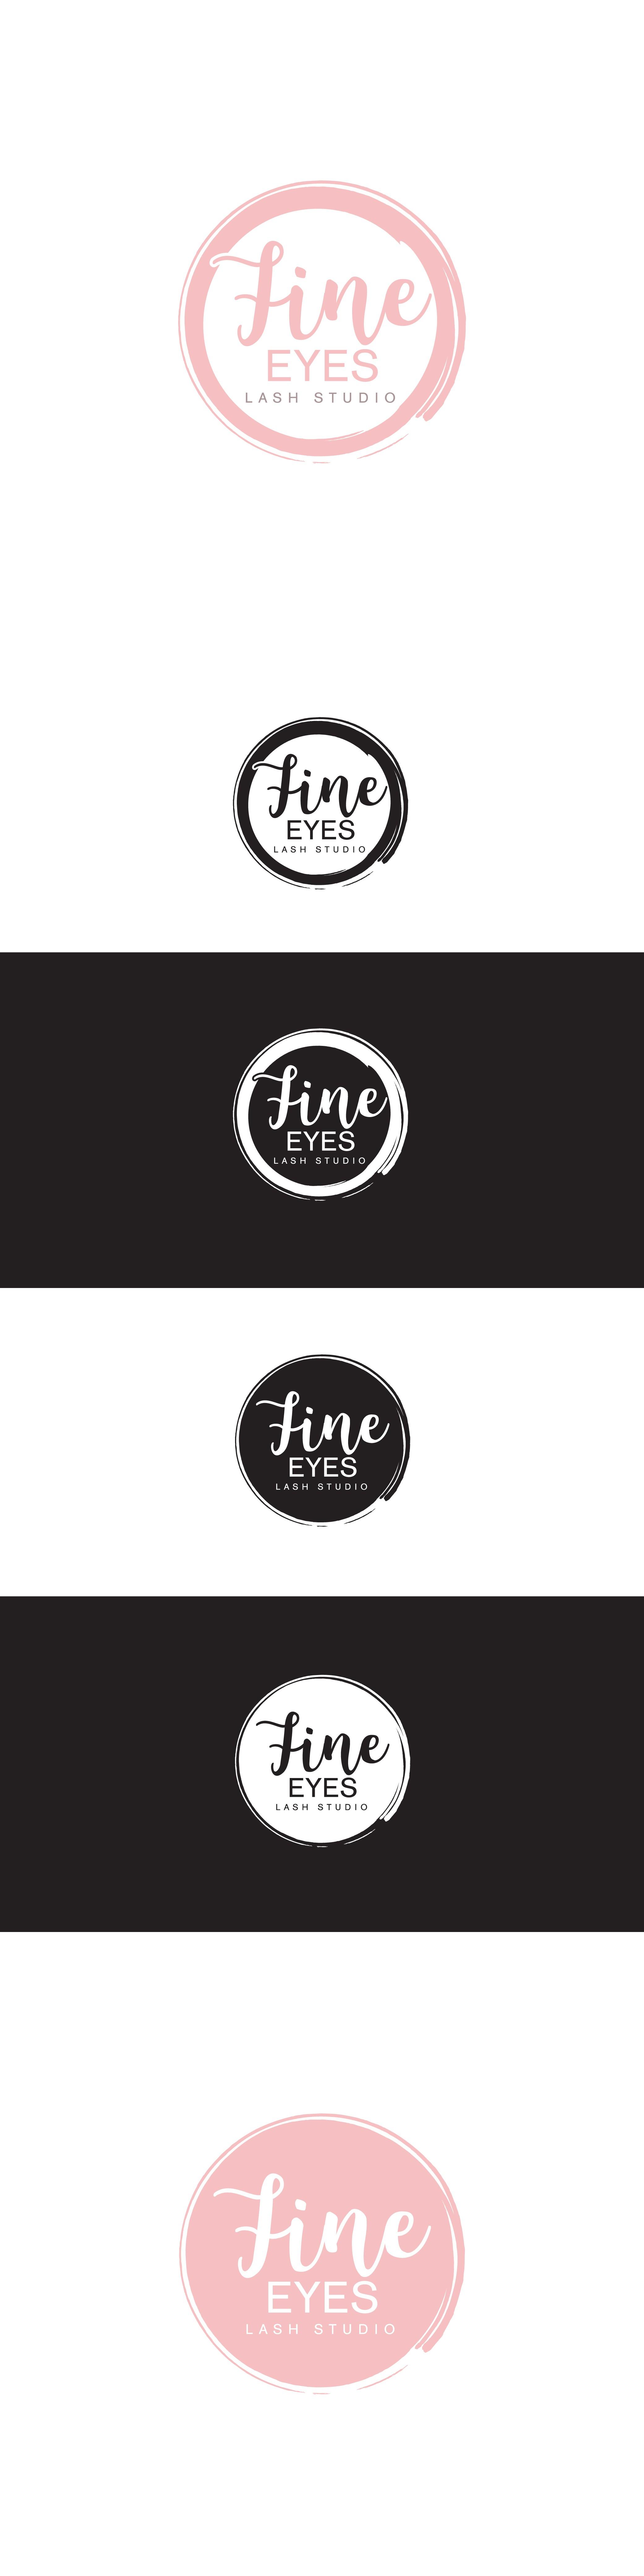 Lash Extension Artist needs classy & elegant logo